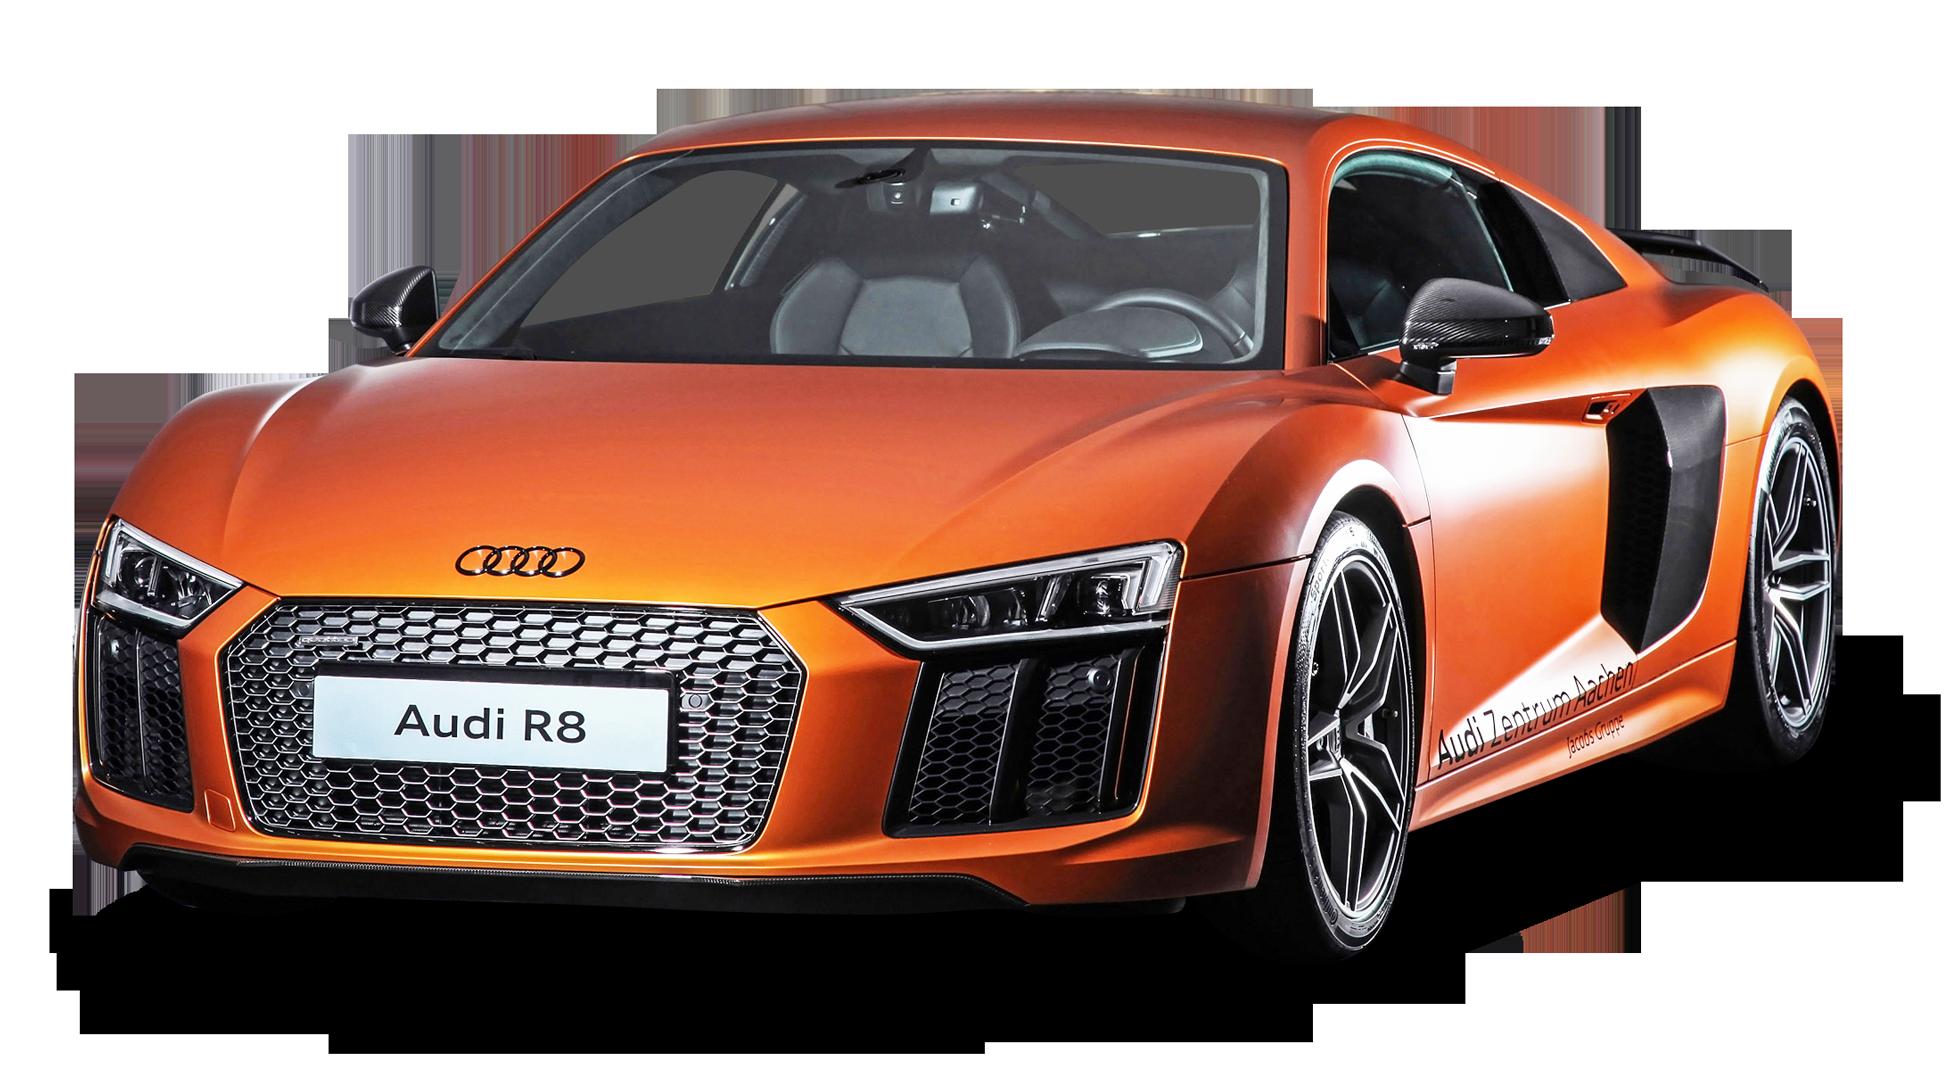 Clipart car orange. Audi r png image